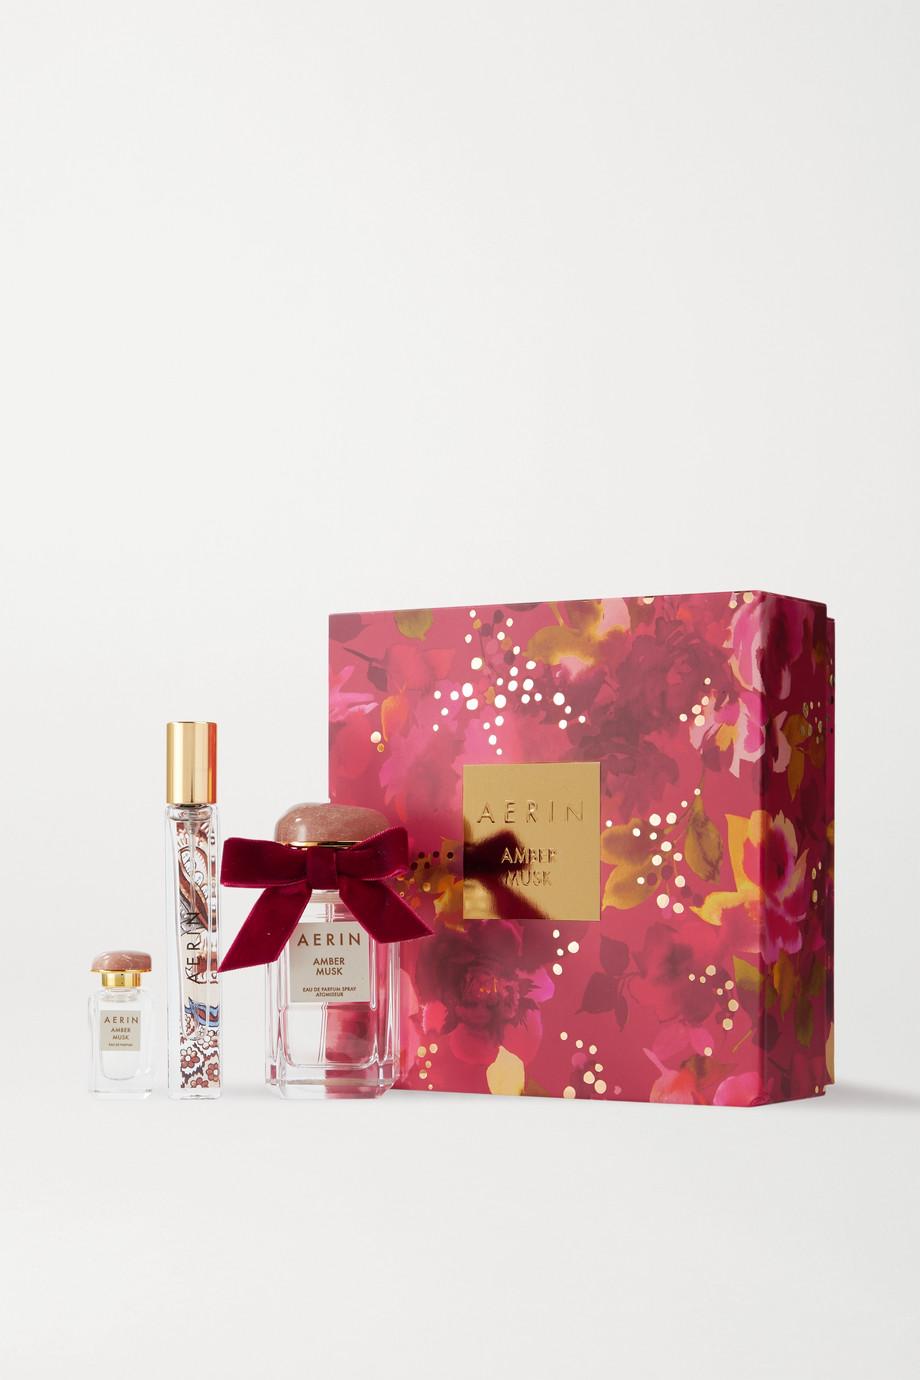 AERIN Beauty Amber Musk Holiday Set